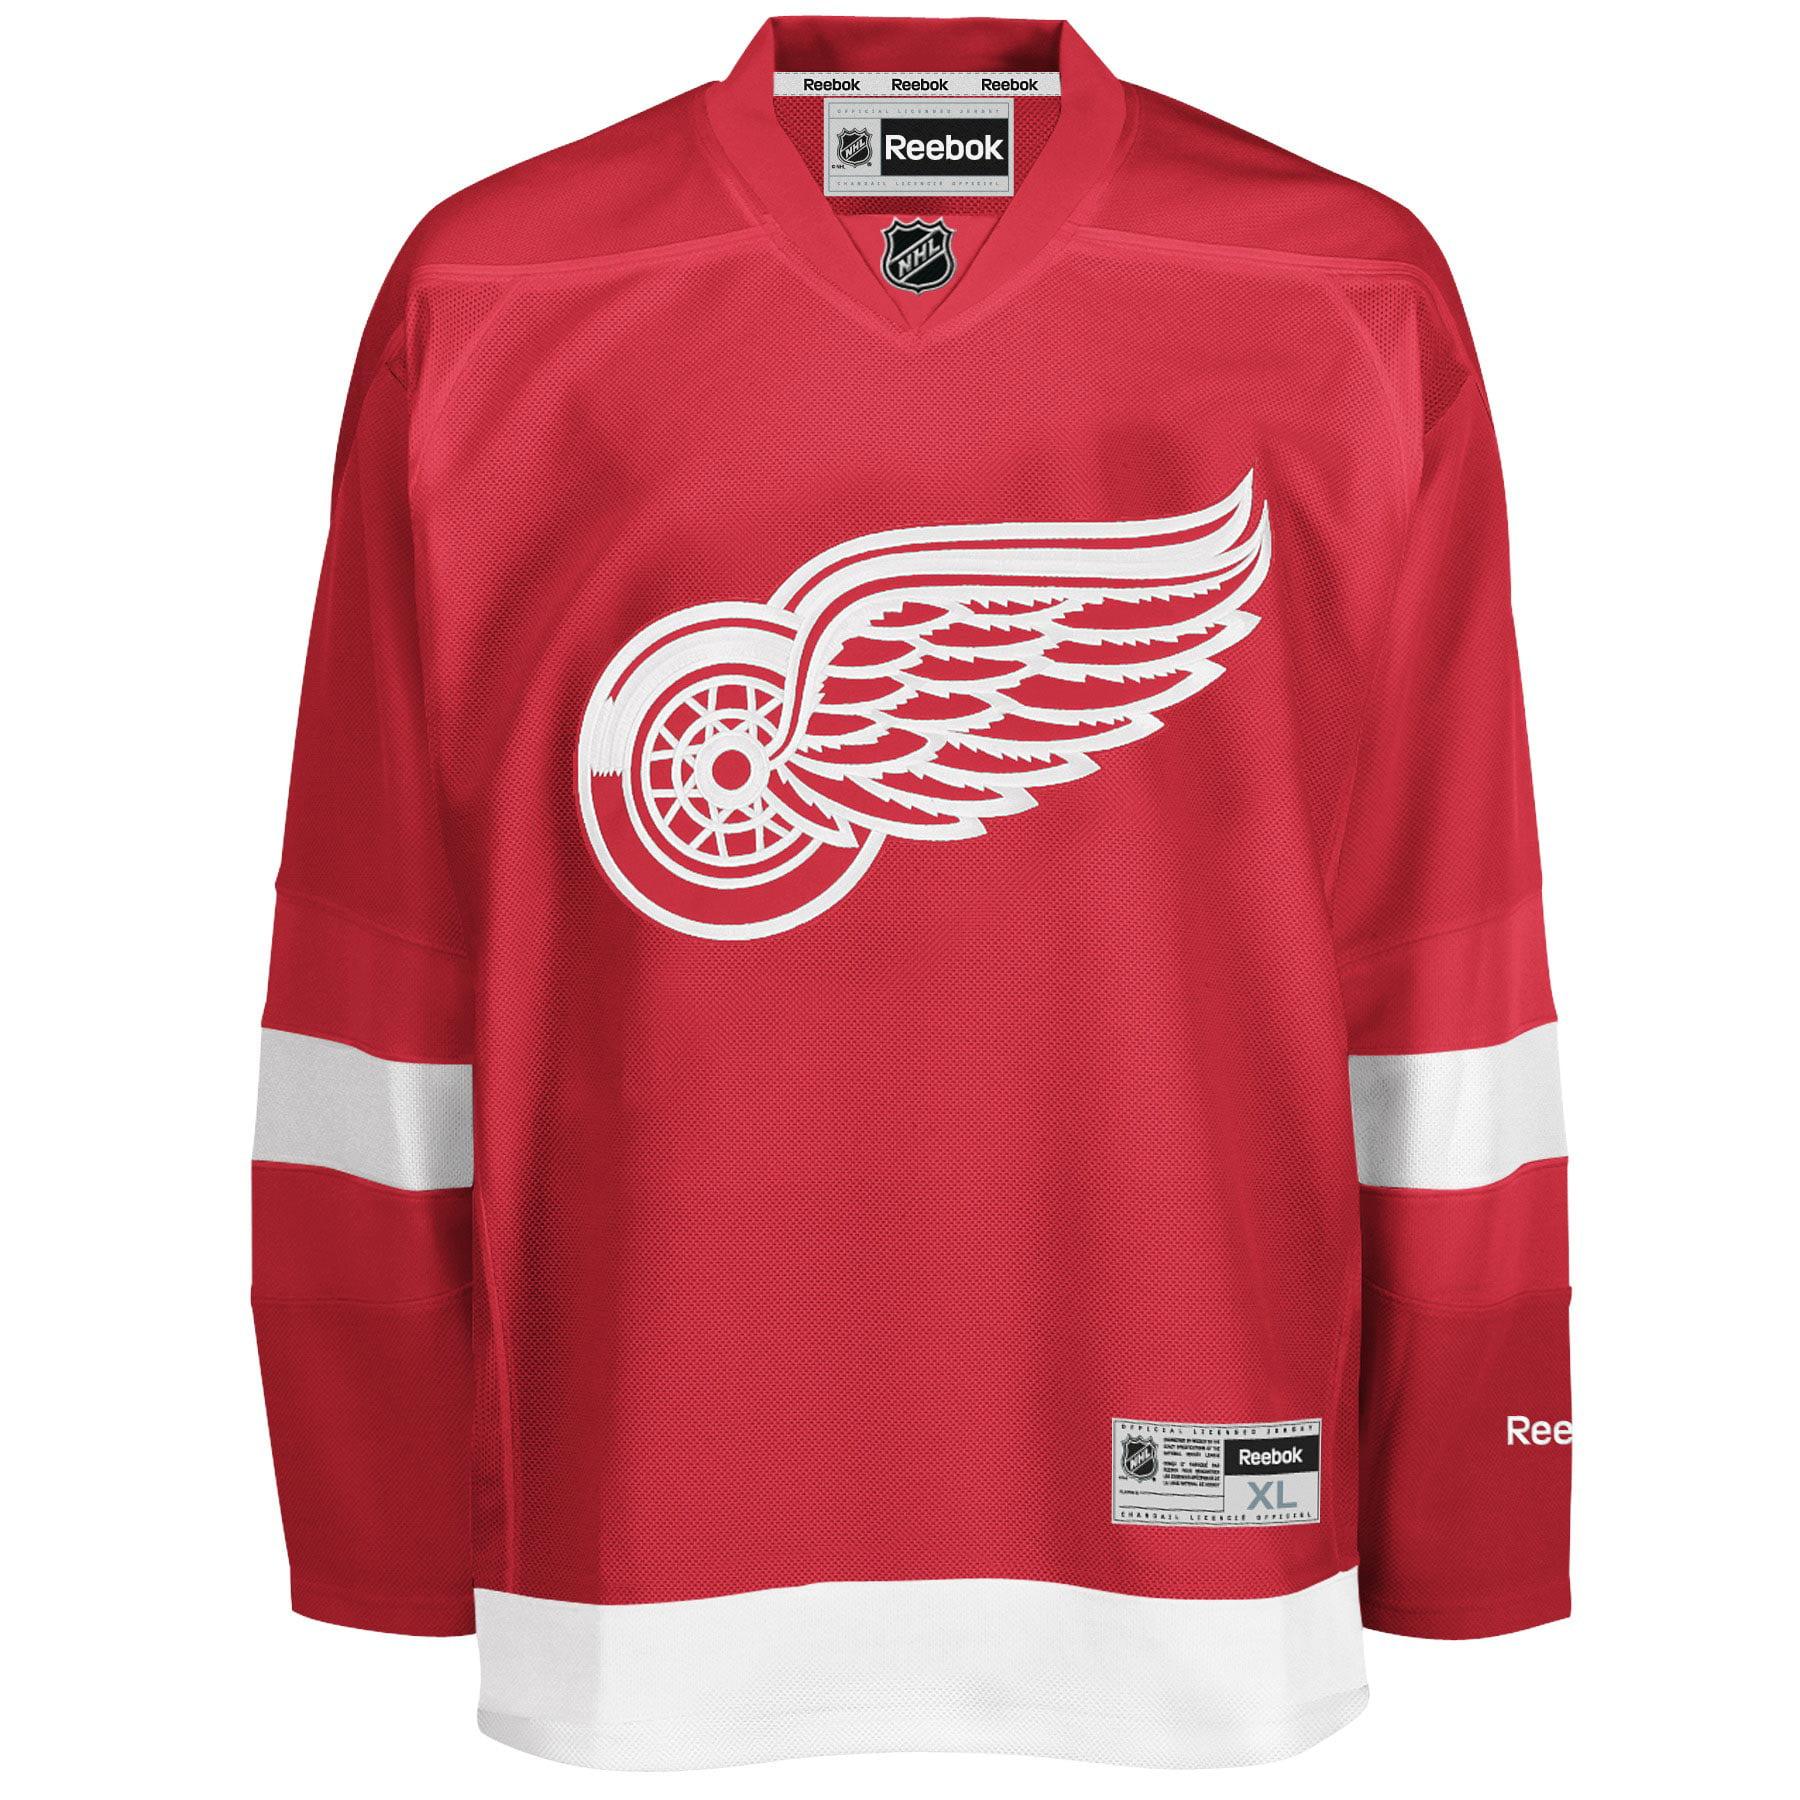 8e76c69849f Detroit Red Wings Reebok Premier Replica Home NHL Hockey Jersey | Walmart  Canada